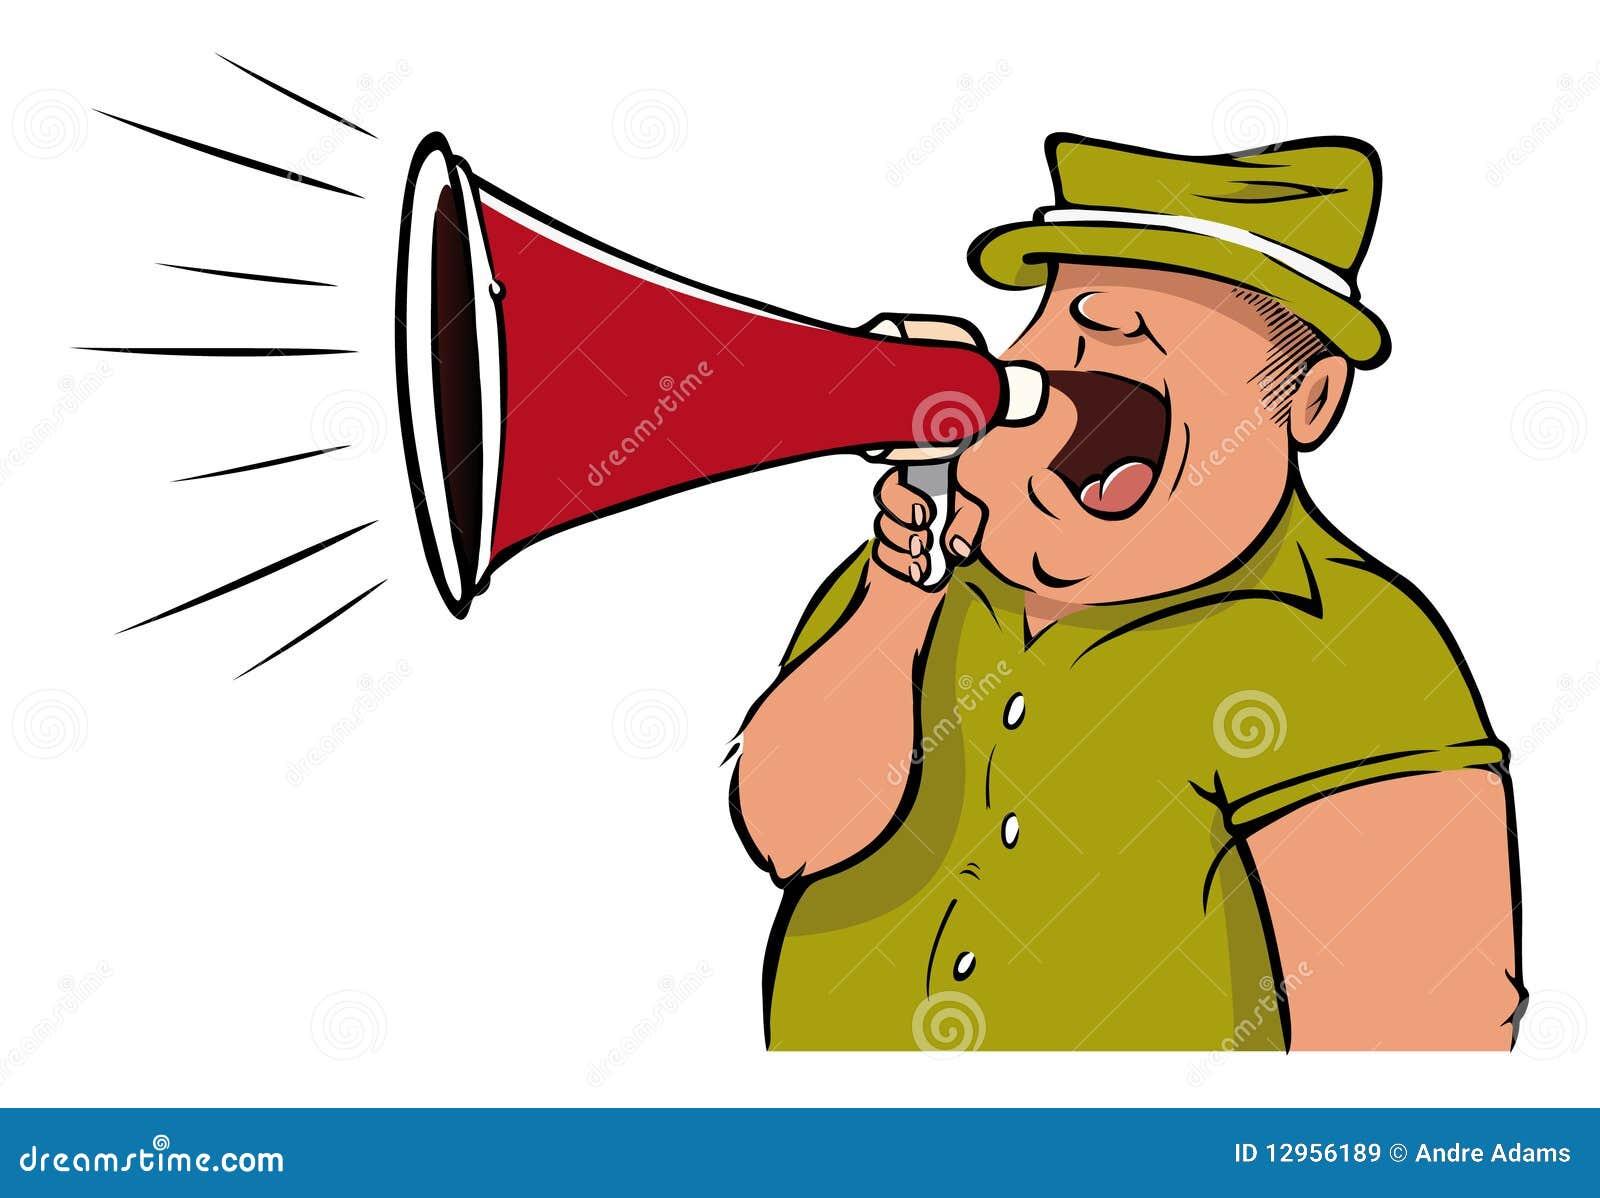 Megaphone man stock vector. Image of scream, sports ...